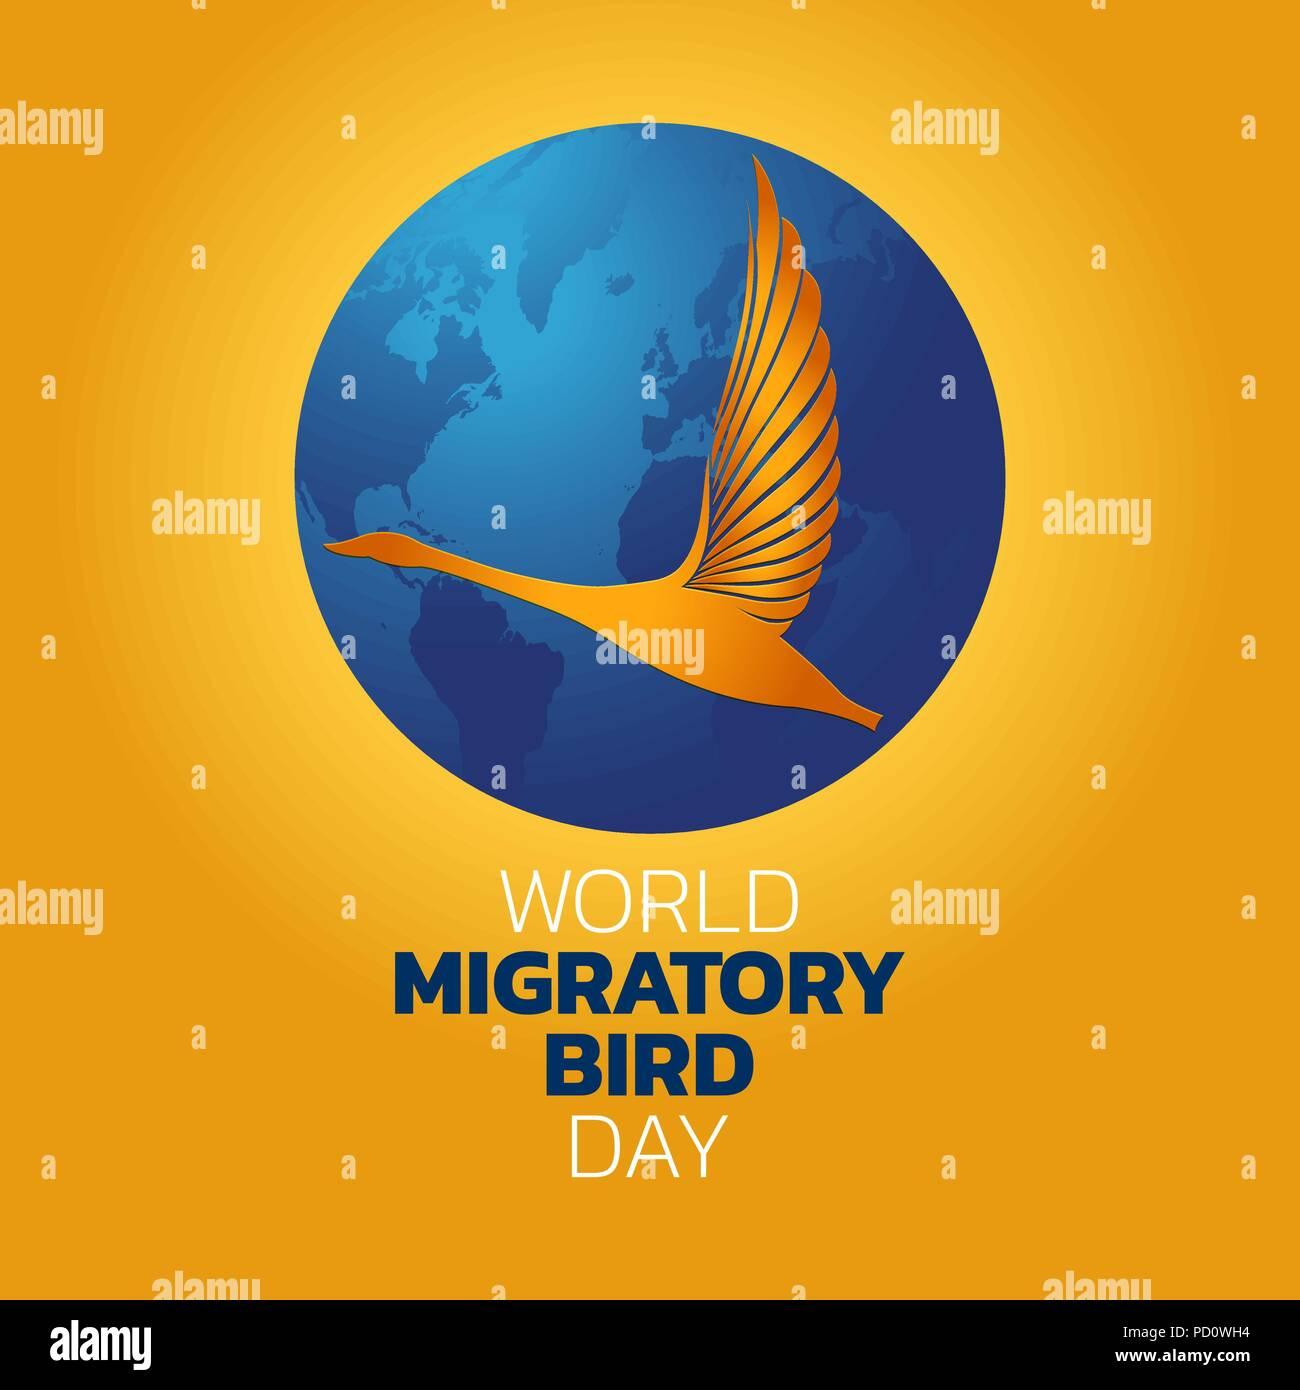 World Migratory Bird Day, vector illustration - Stock Vector